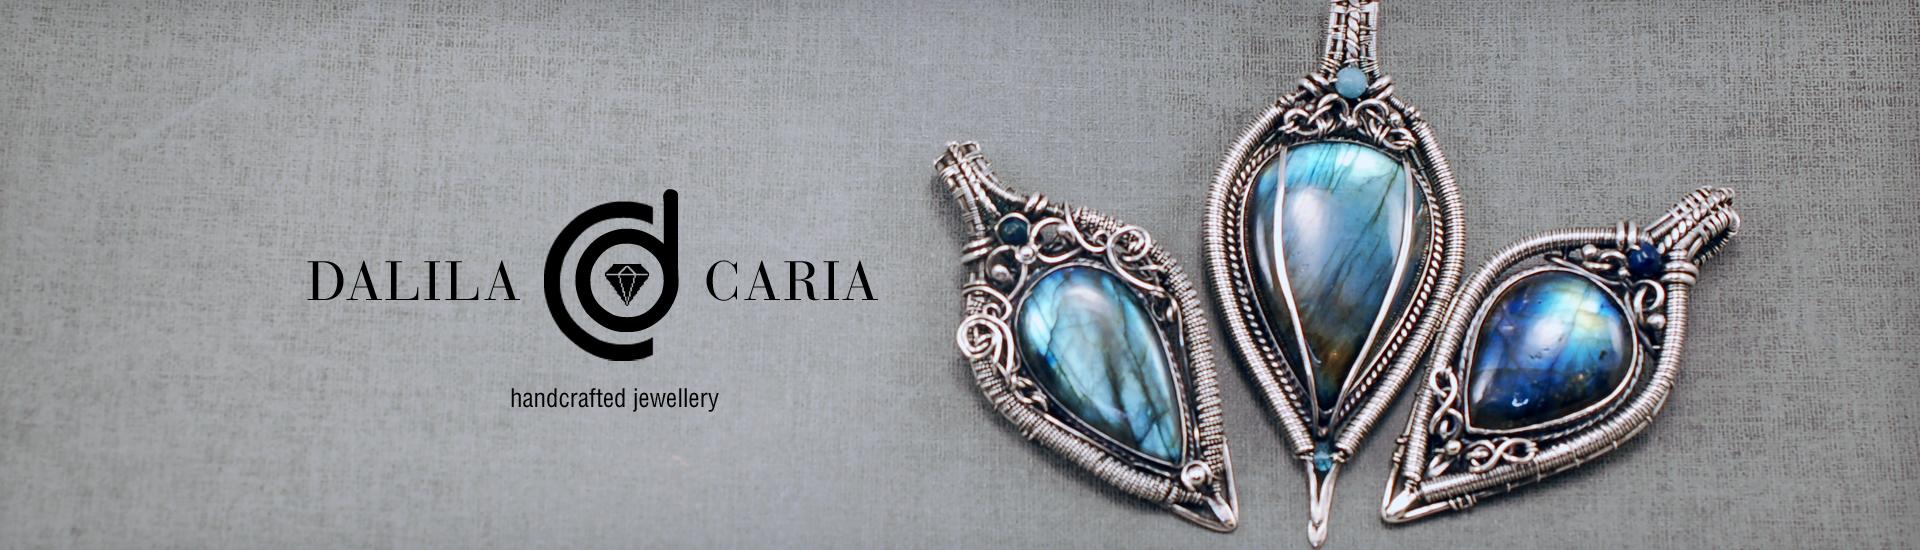 Dalila Caria – Bijutaria Artesanal – Handcrafted Jewellery